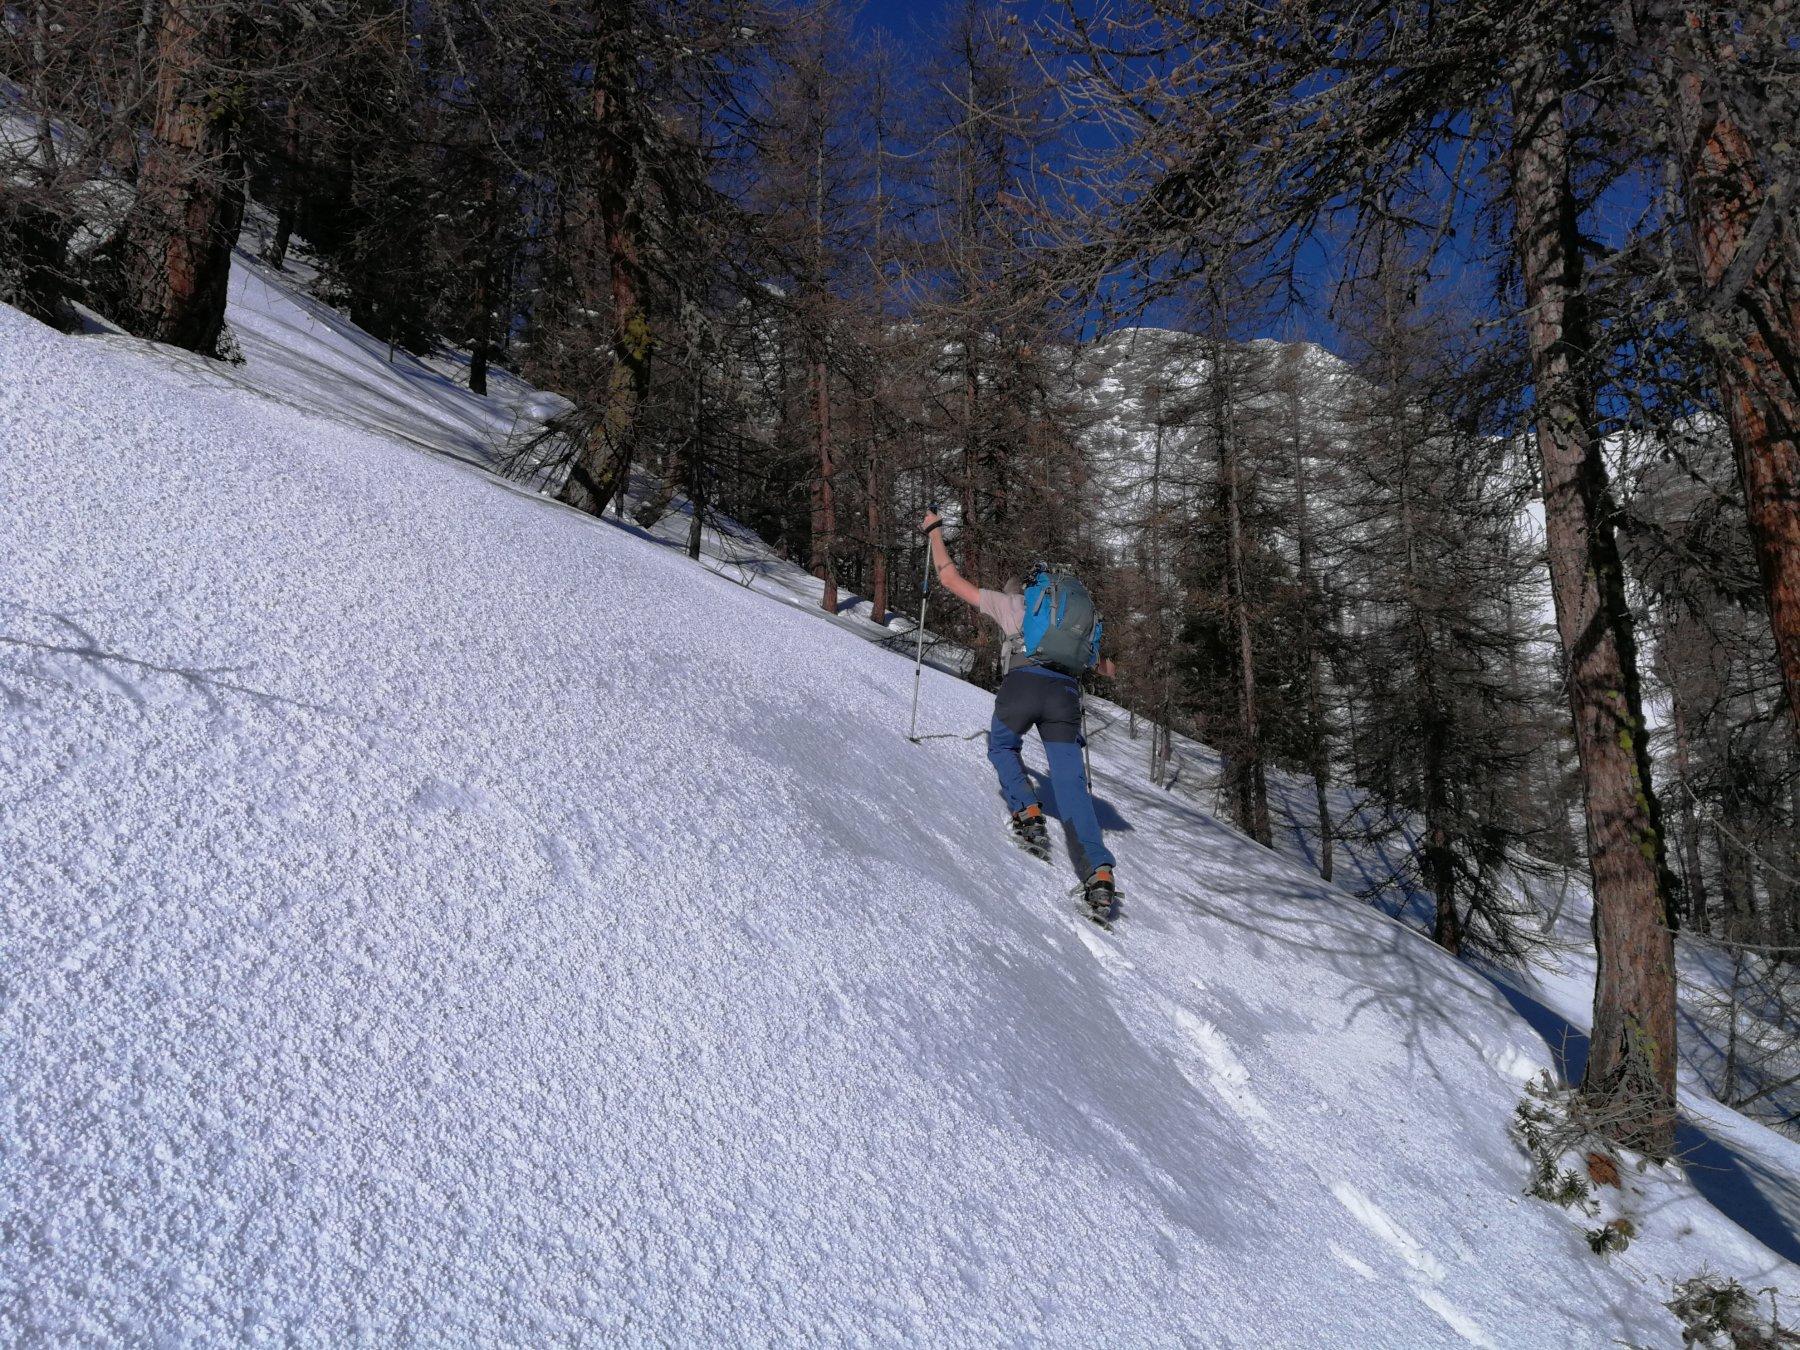 In salita fra i larici, in un bel tratto di neve compatta (foto E. Lana).